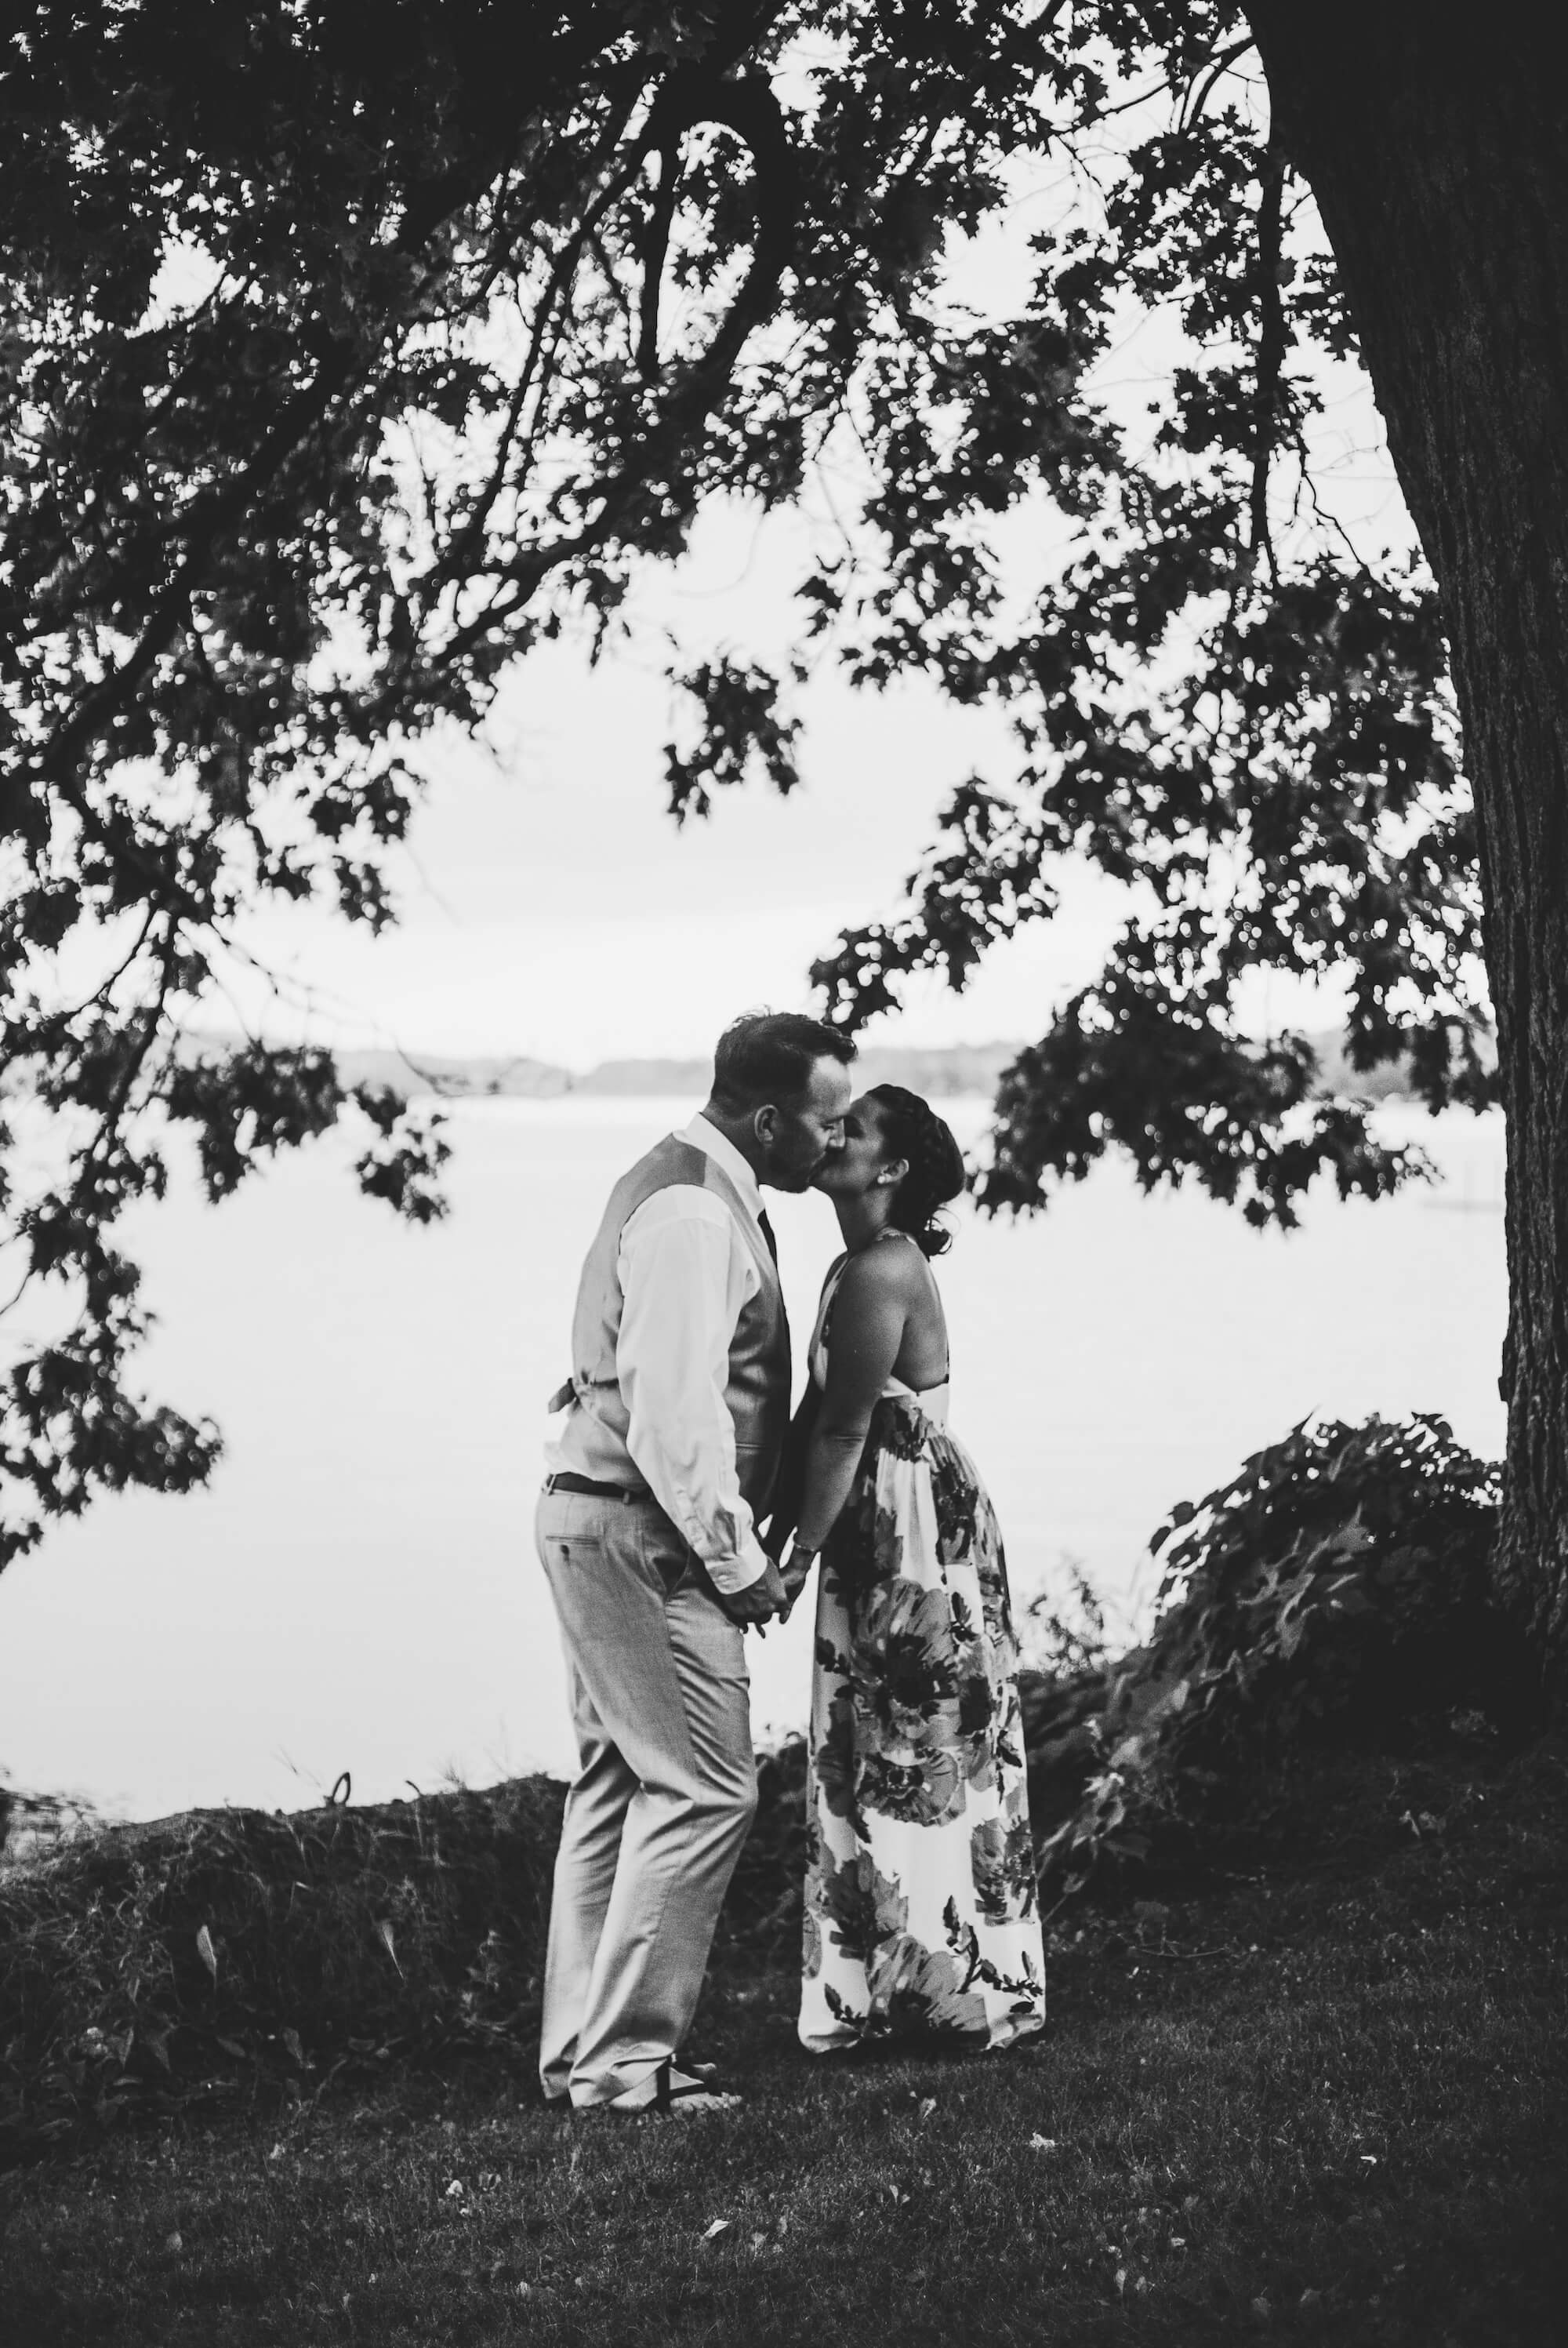 engle-olson-maddy-pat-mn-wedding-photography-38.jpg